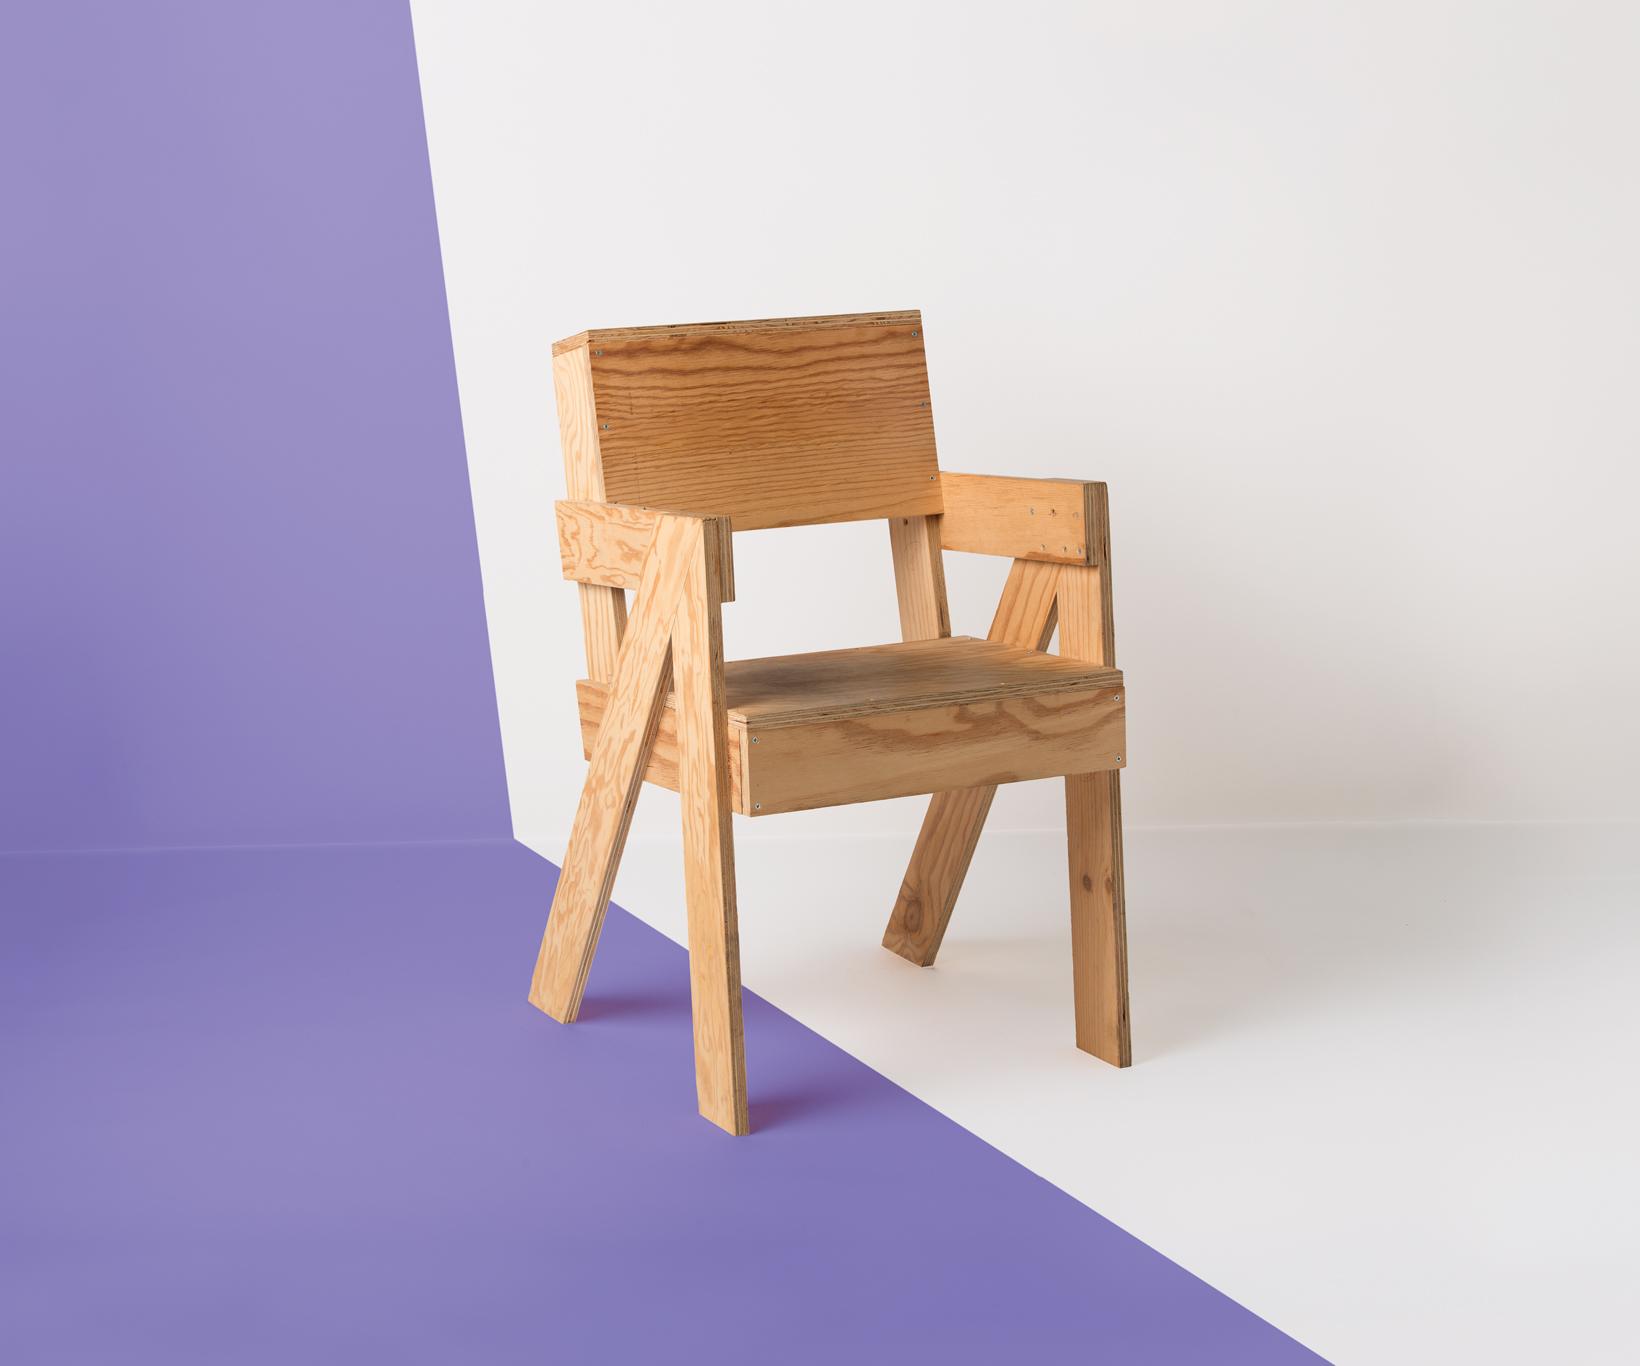 fauteuil scala fabrication. Black Bedroom Furniture Sets. Home Design Ideas